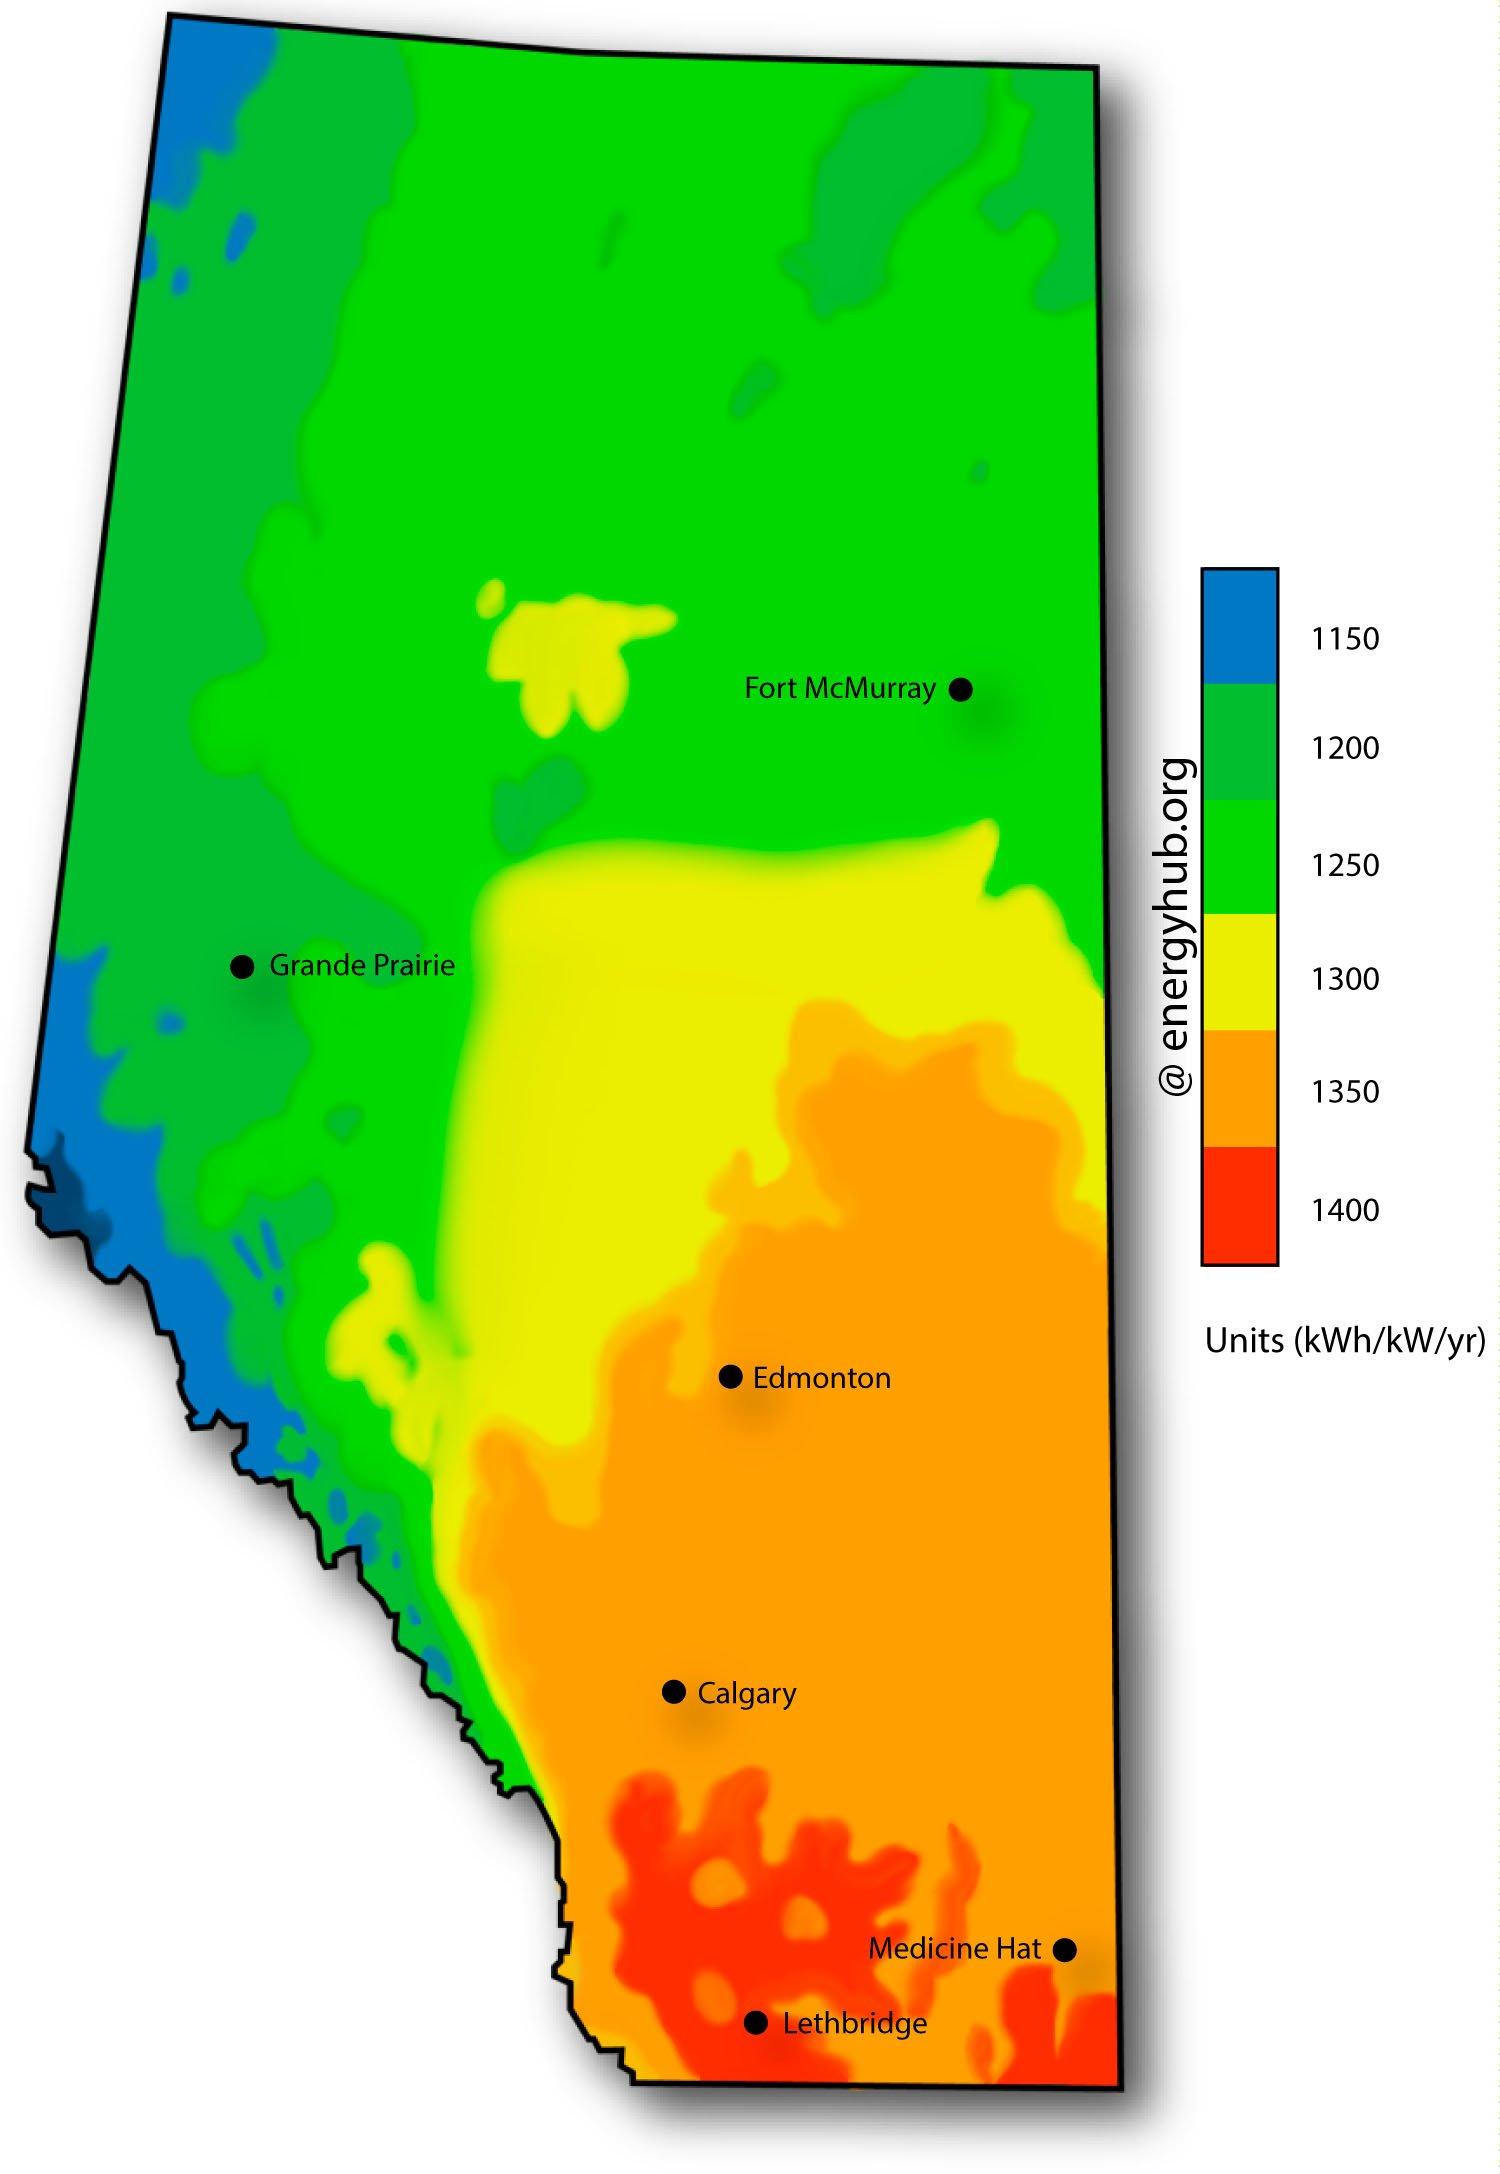 Solar Energy Maps Canada (Every Province) on